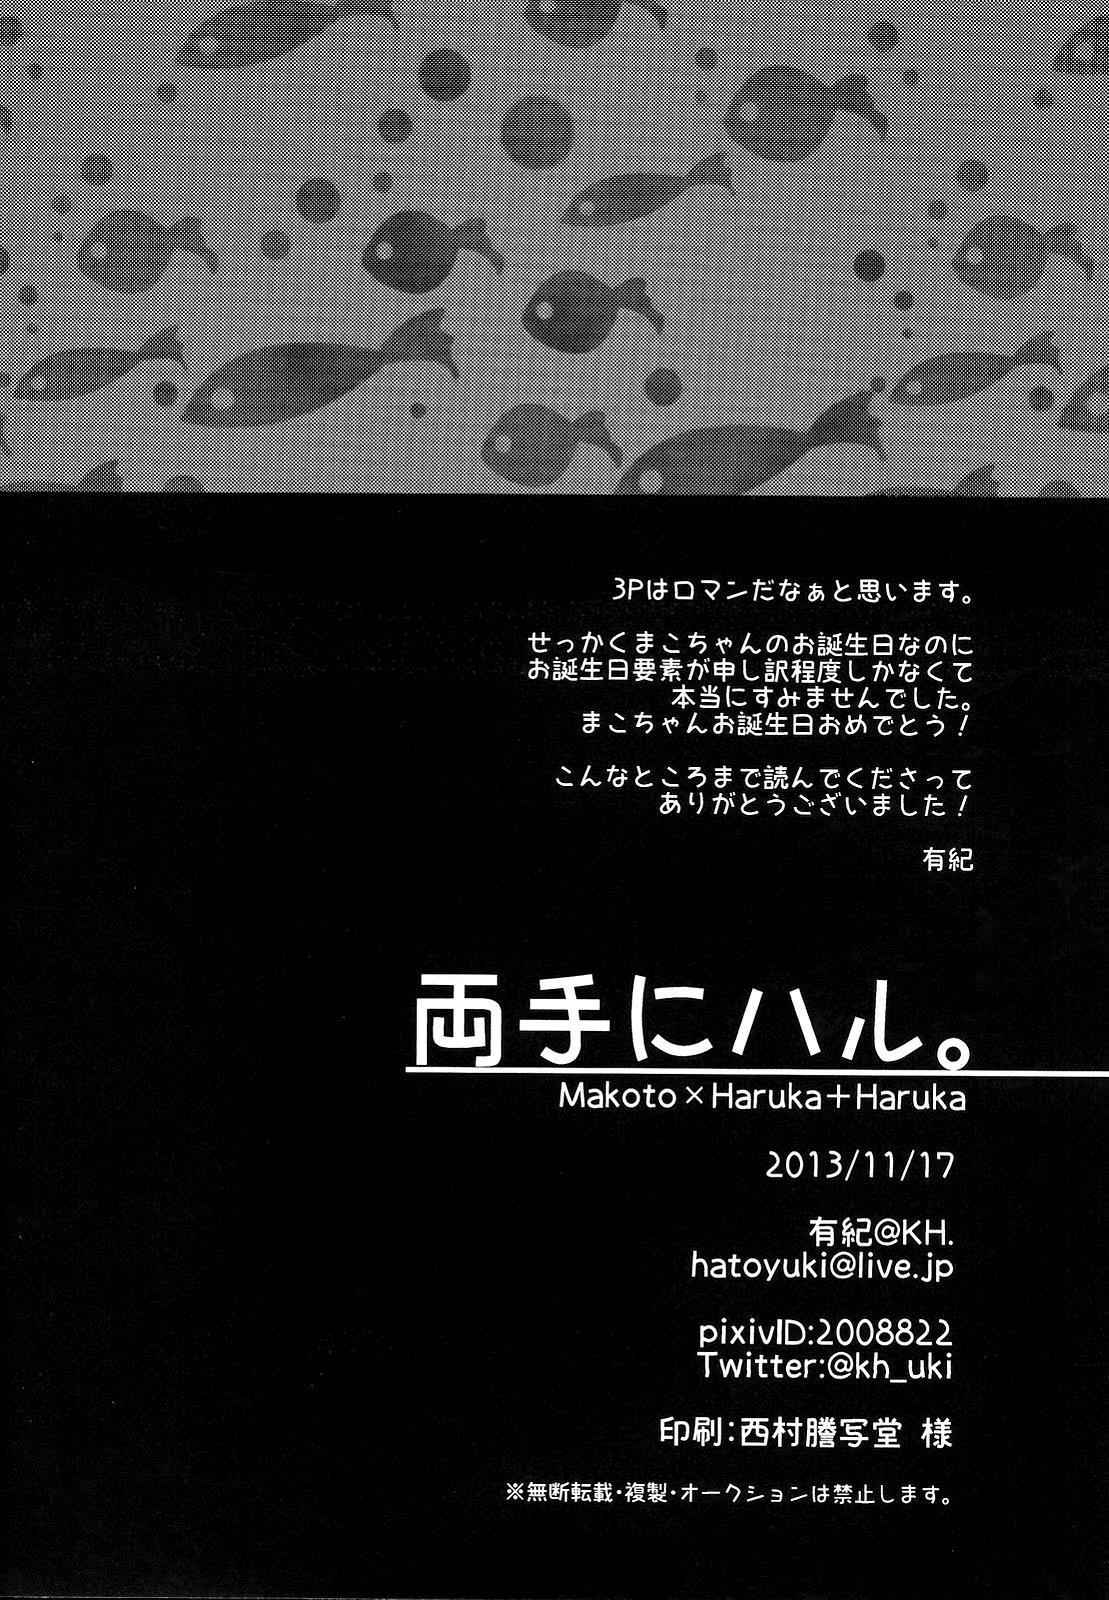 Ryote ni Haru. | A Haru in Both Hands. 15